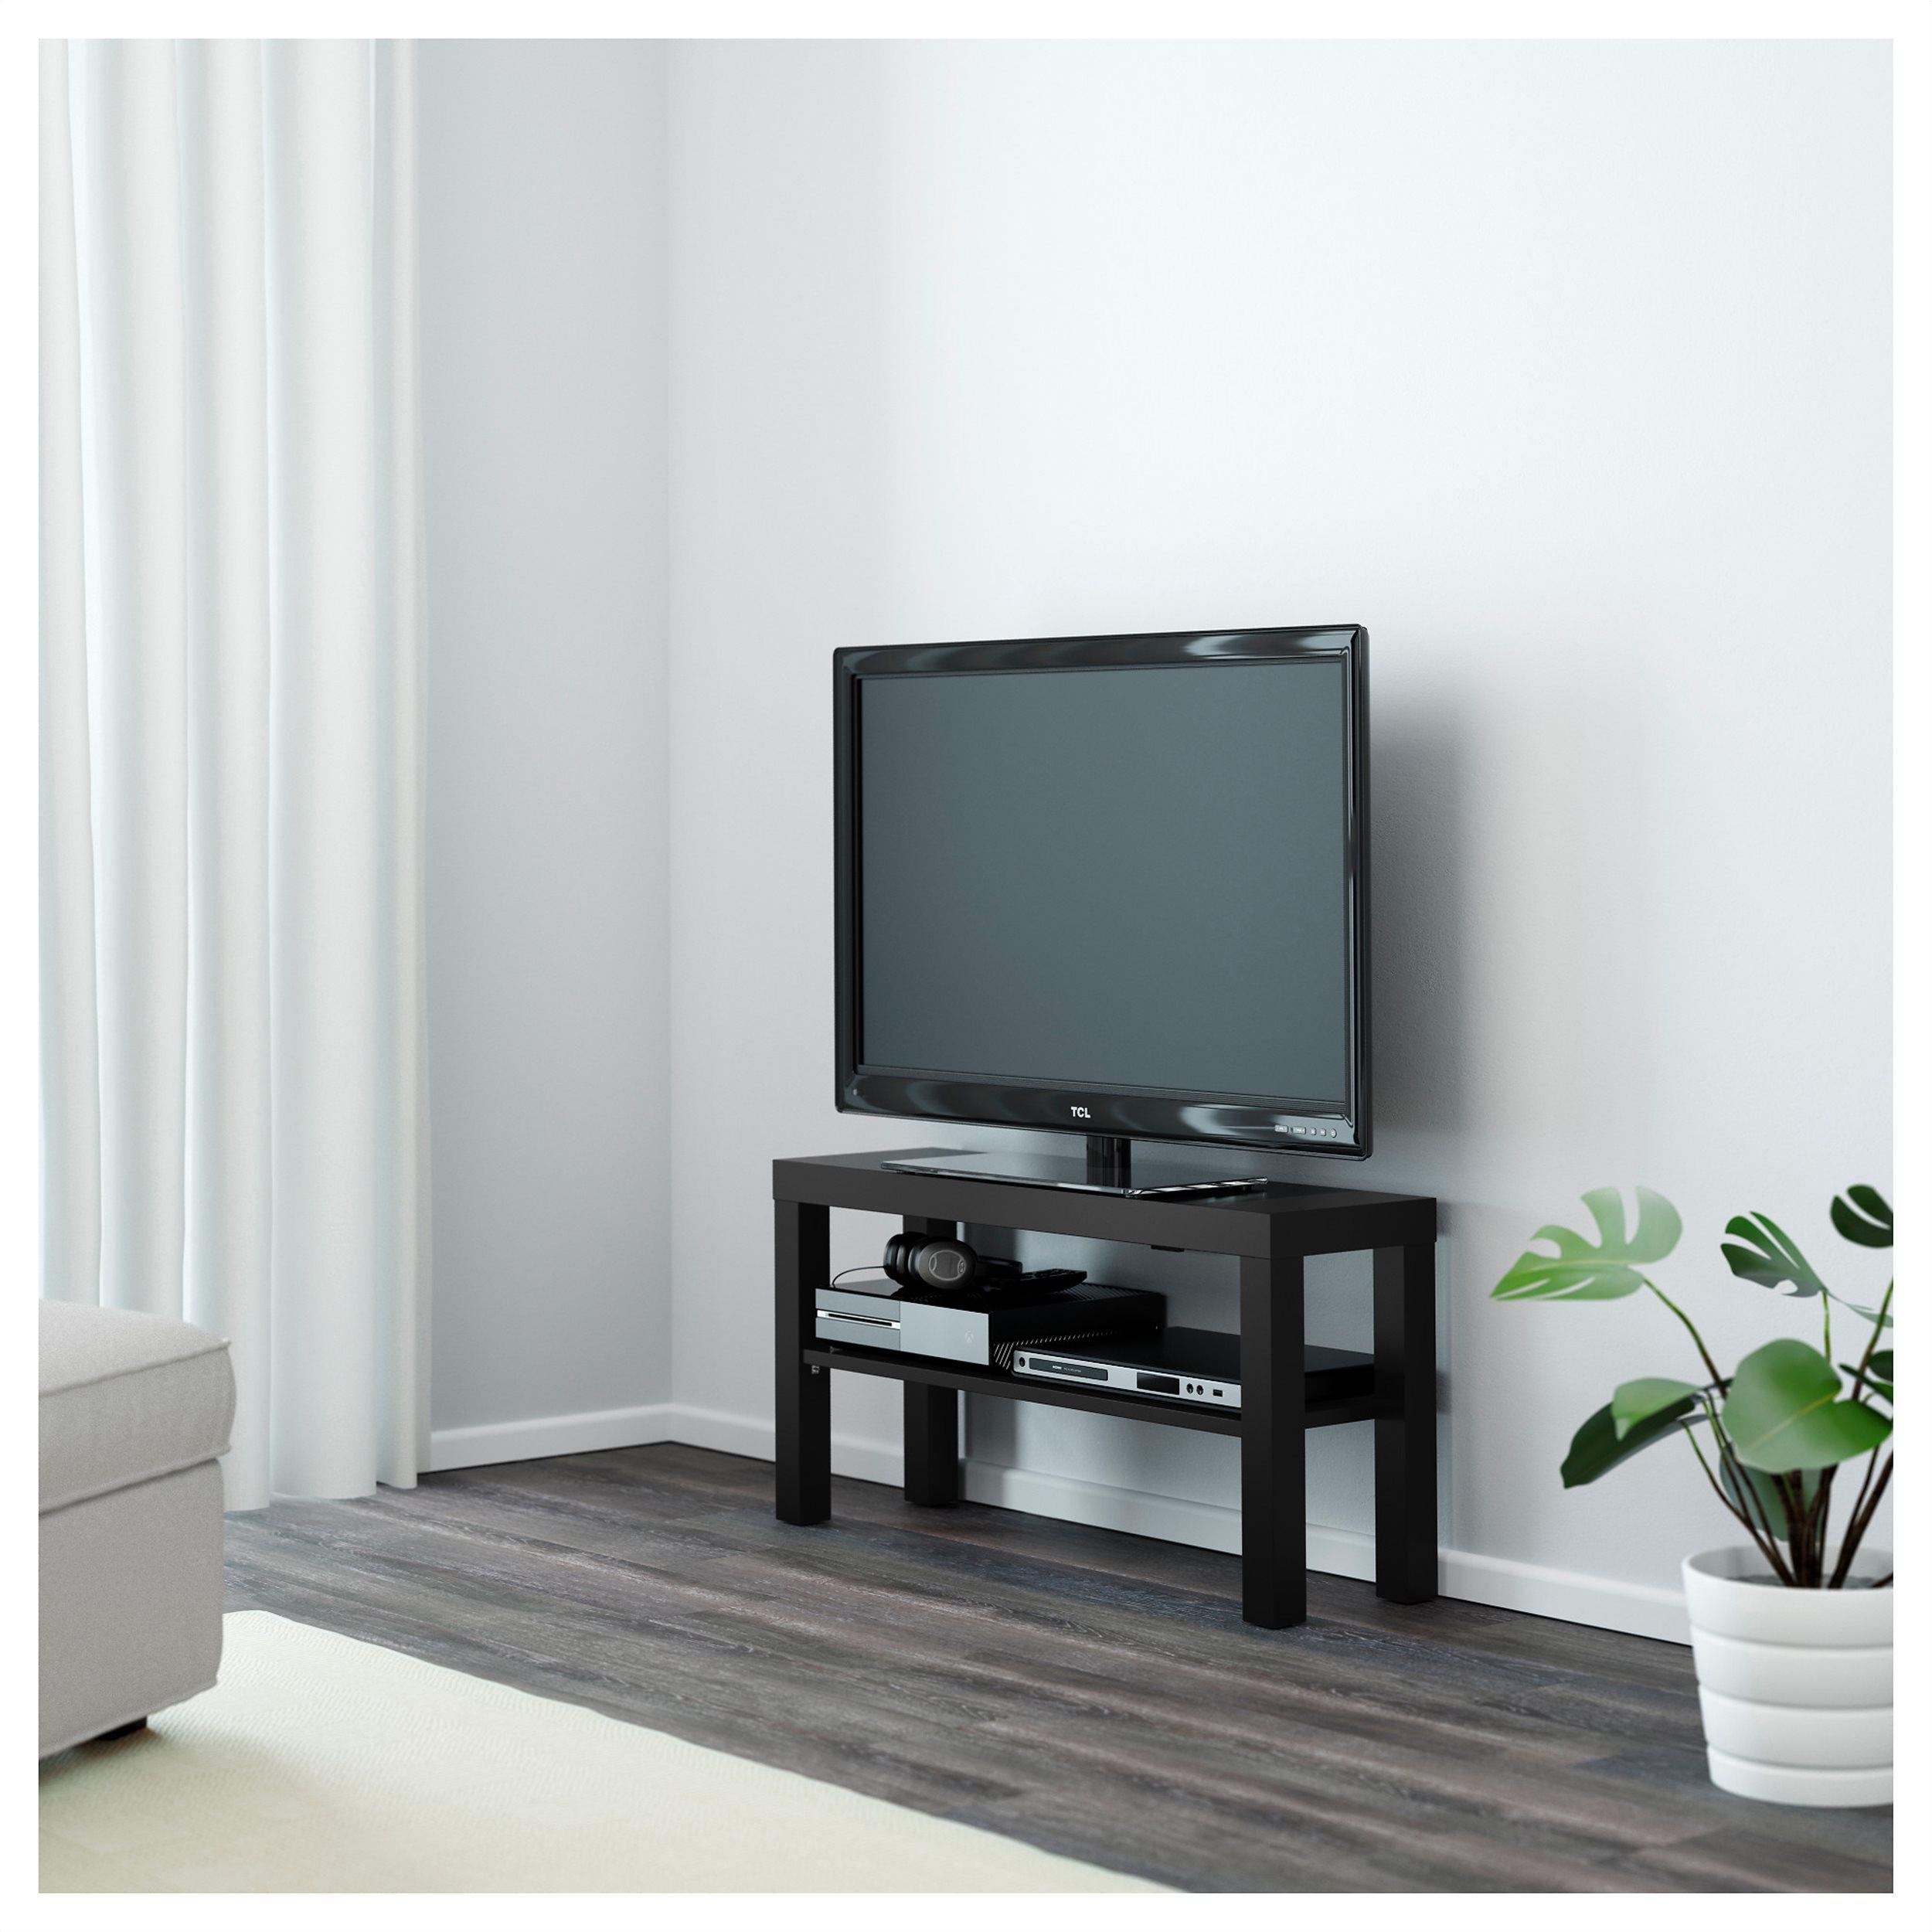 Fernseher Bei Ikea